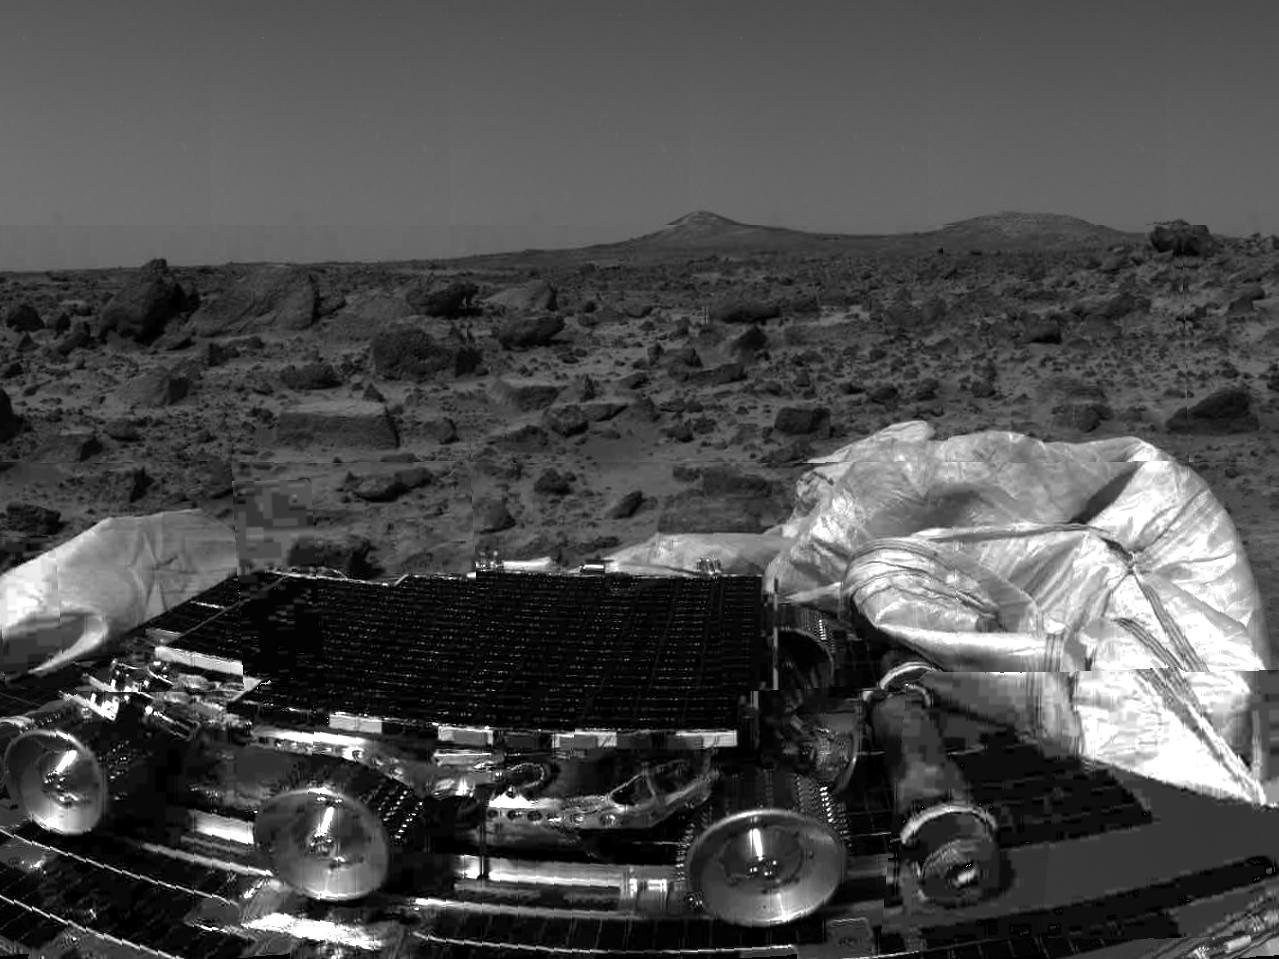 mars rover sojourner - photo #24